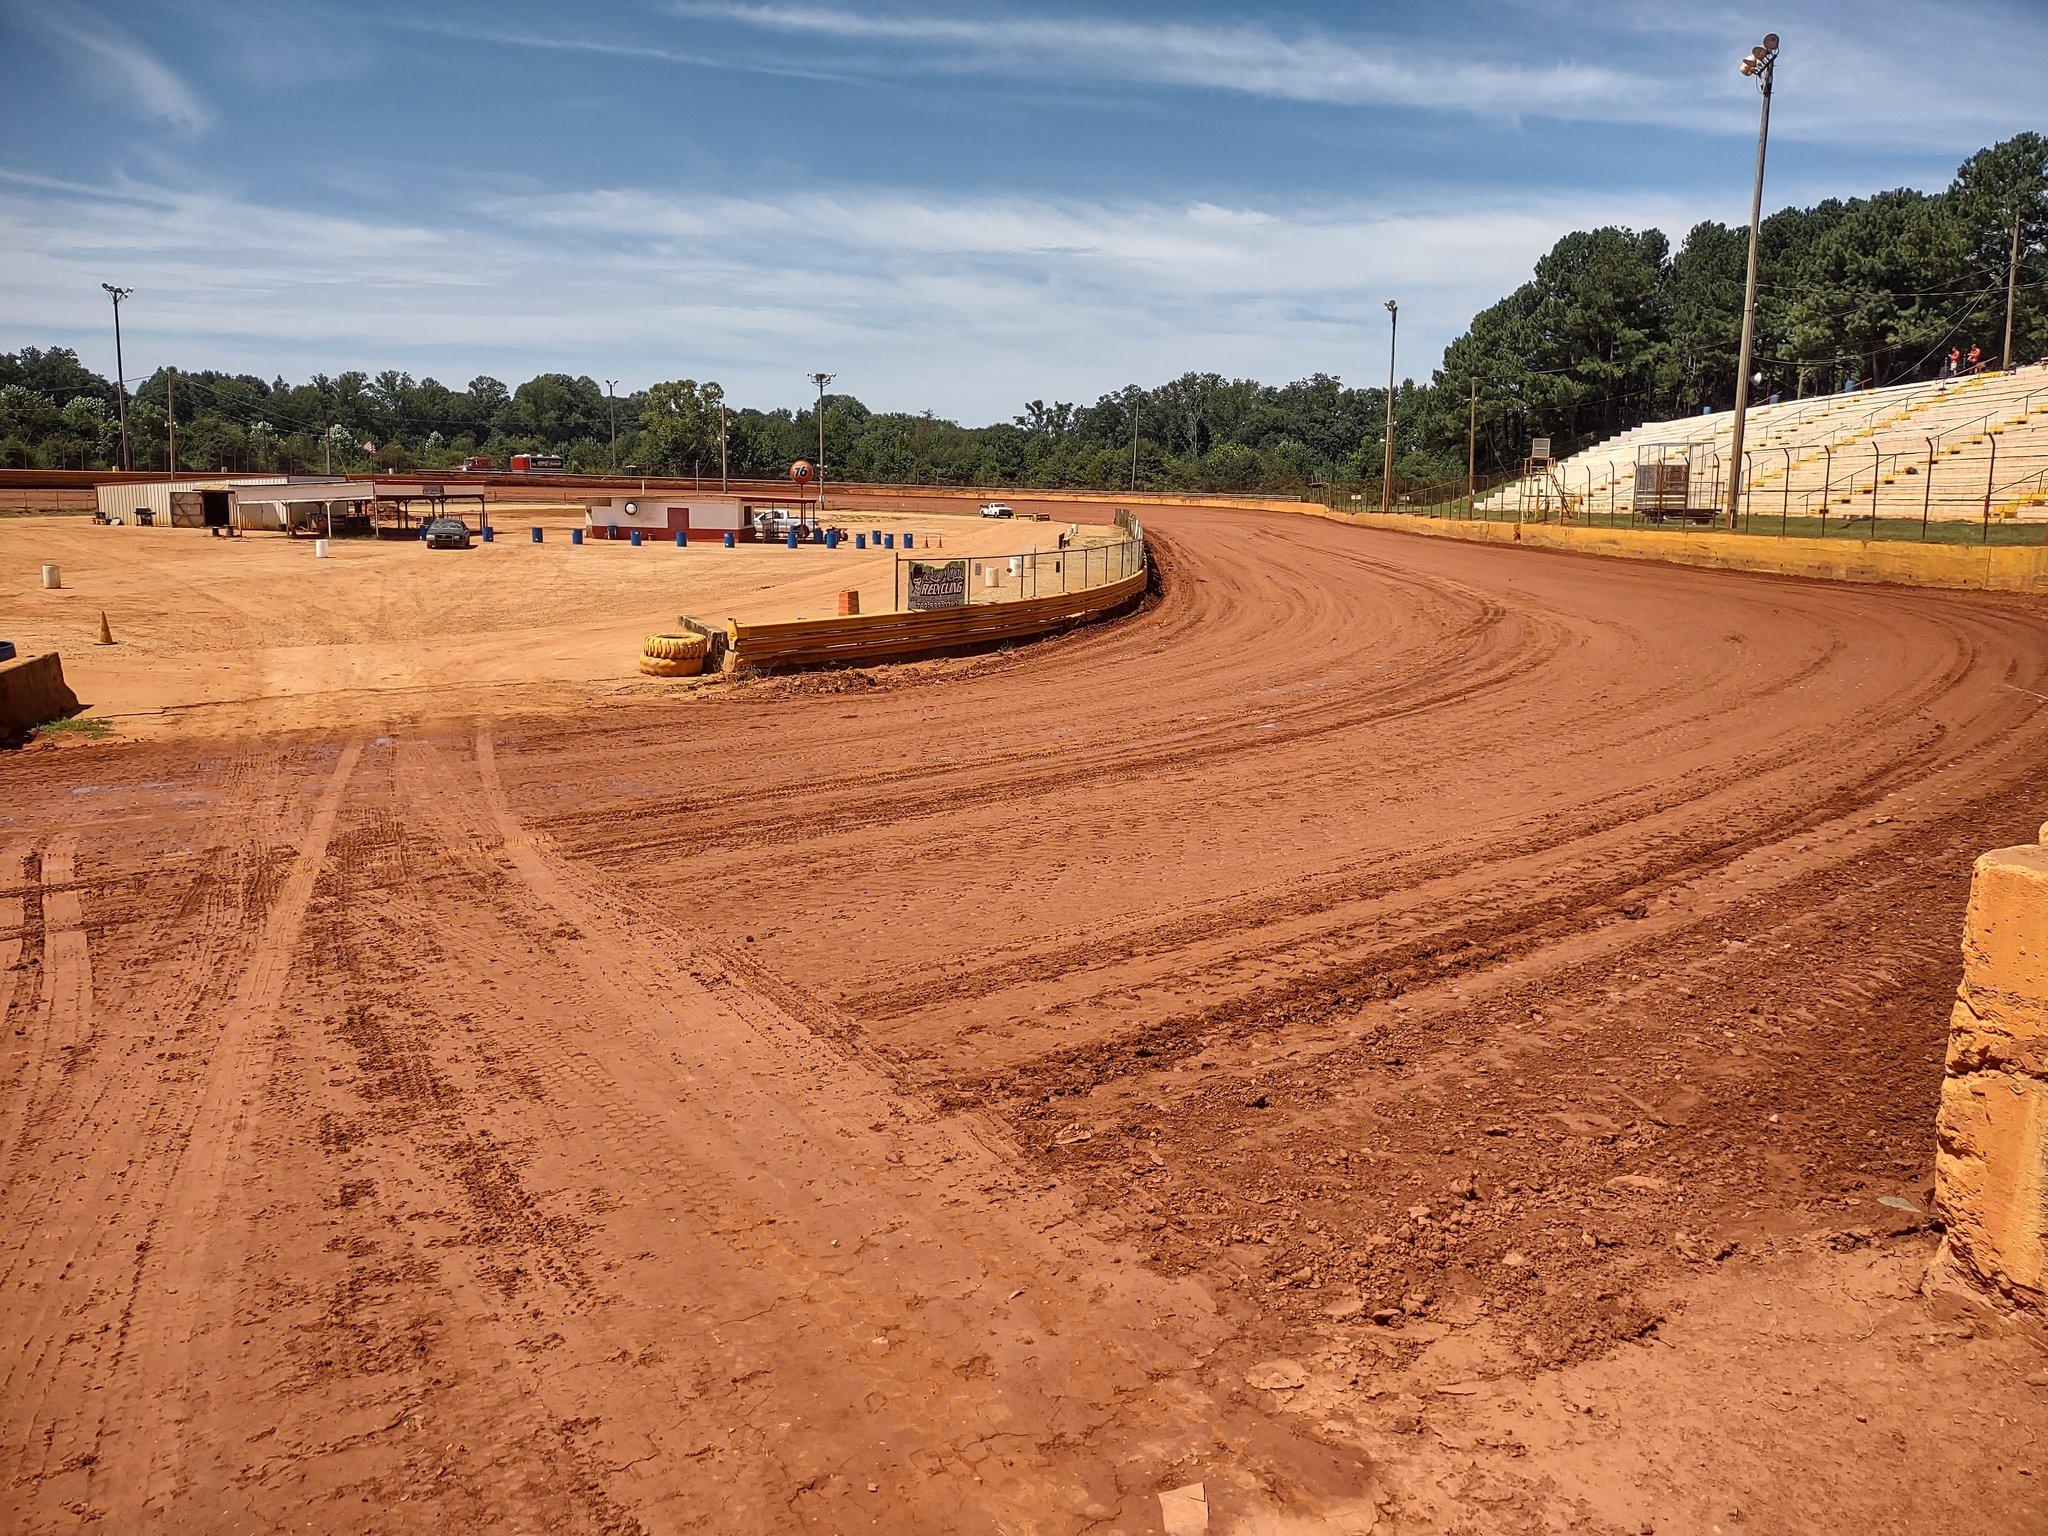 Lavonia Speedway